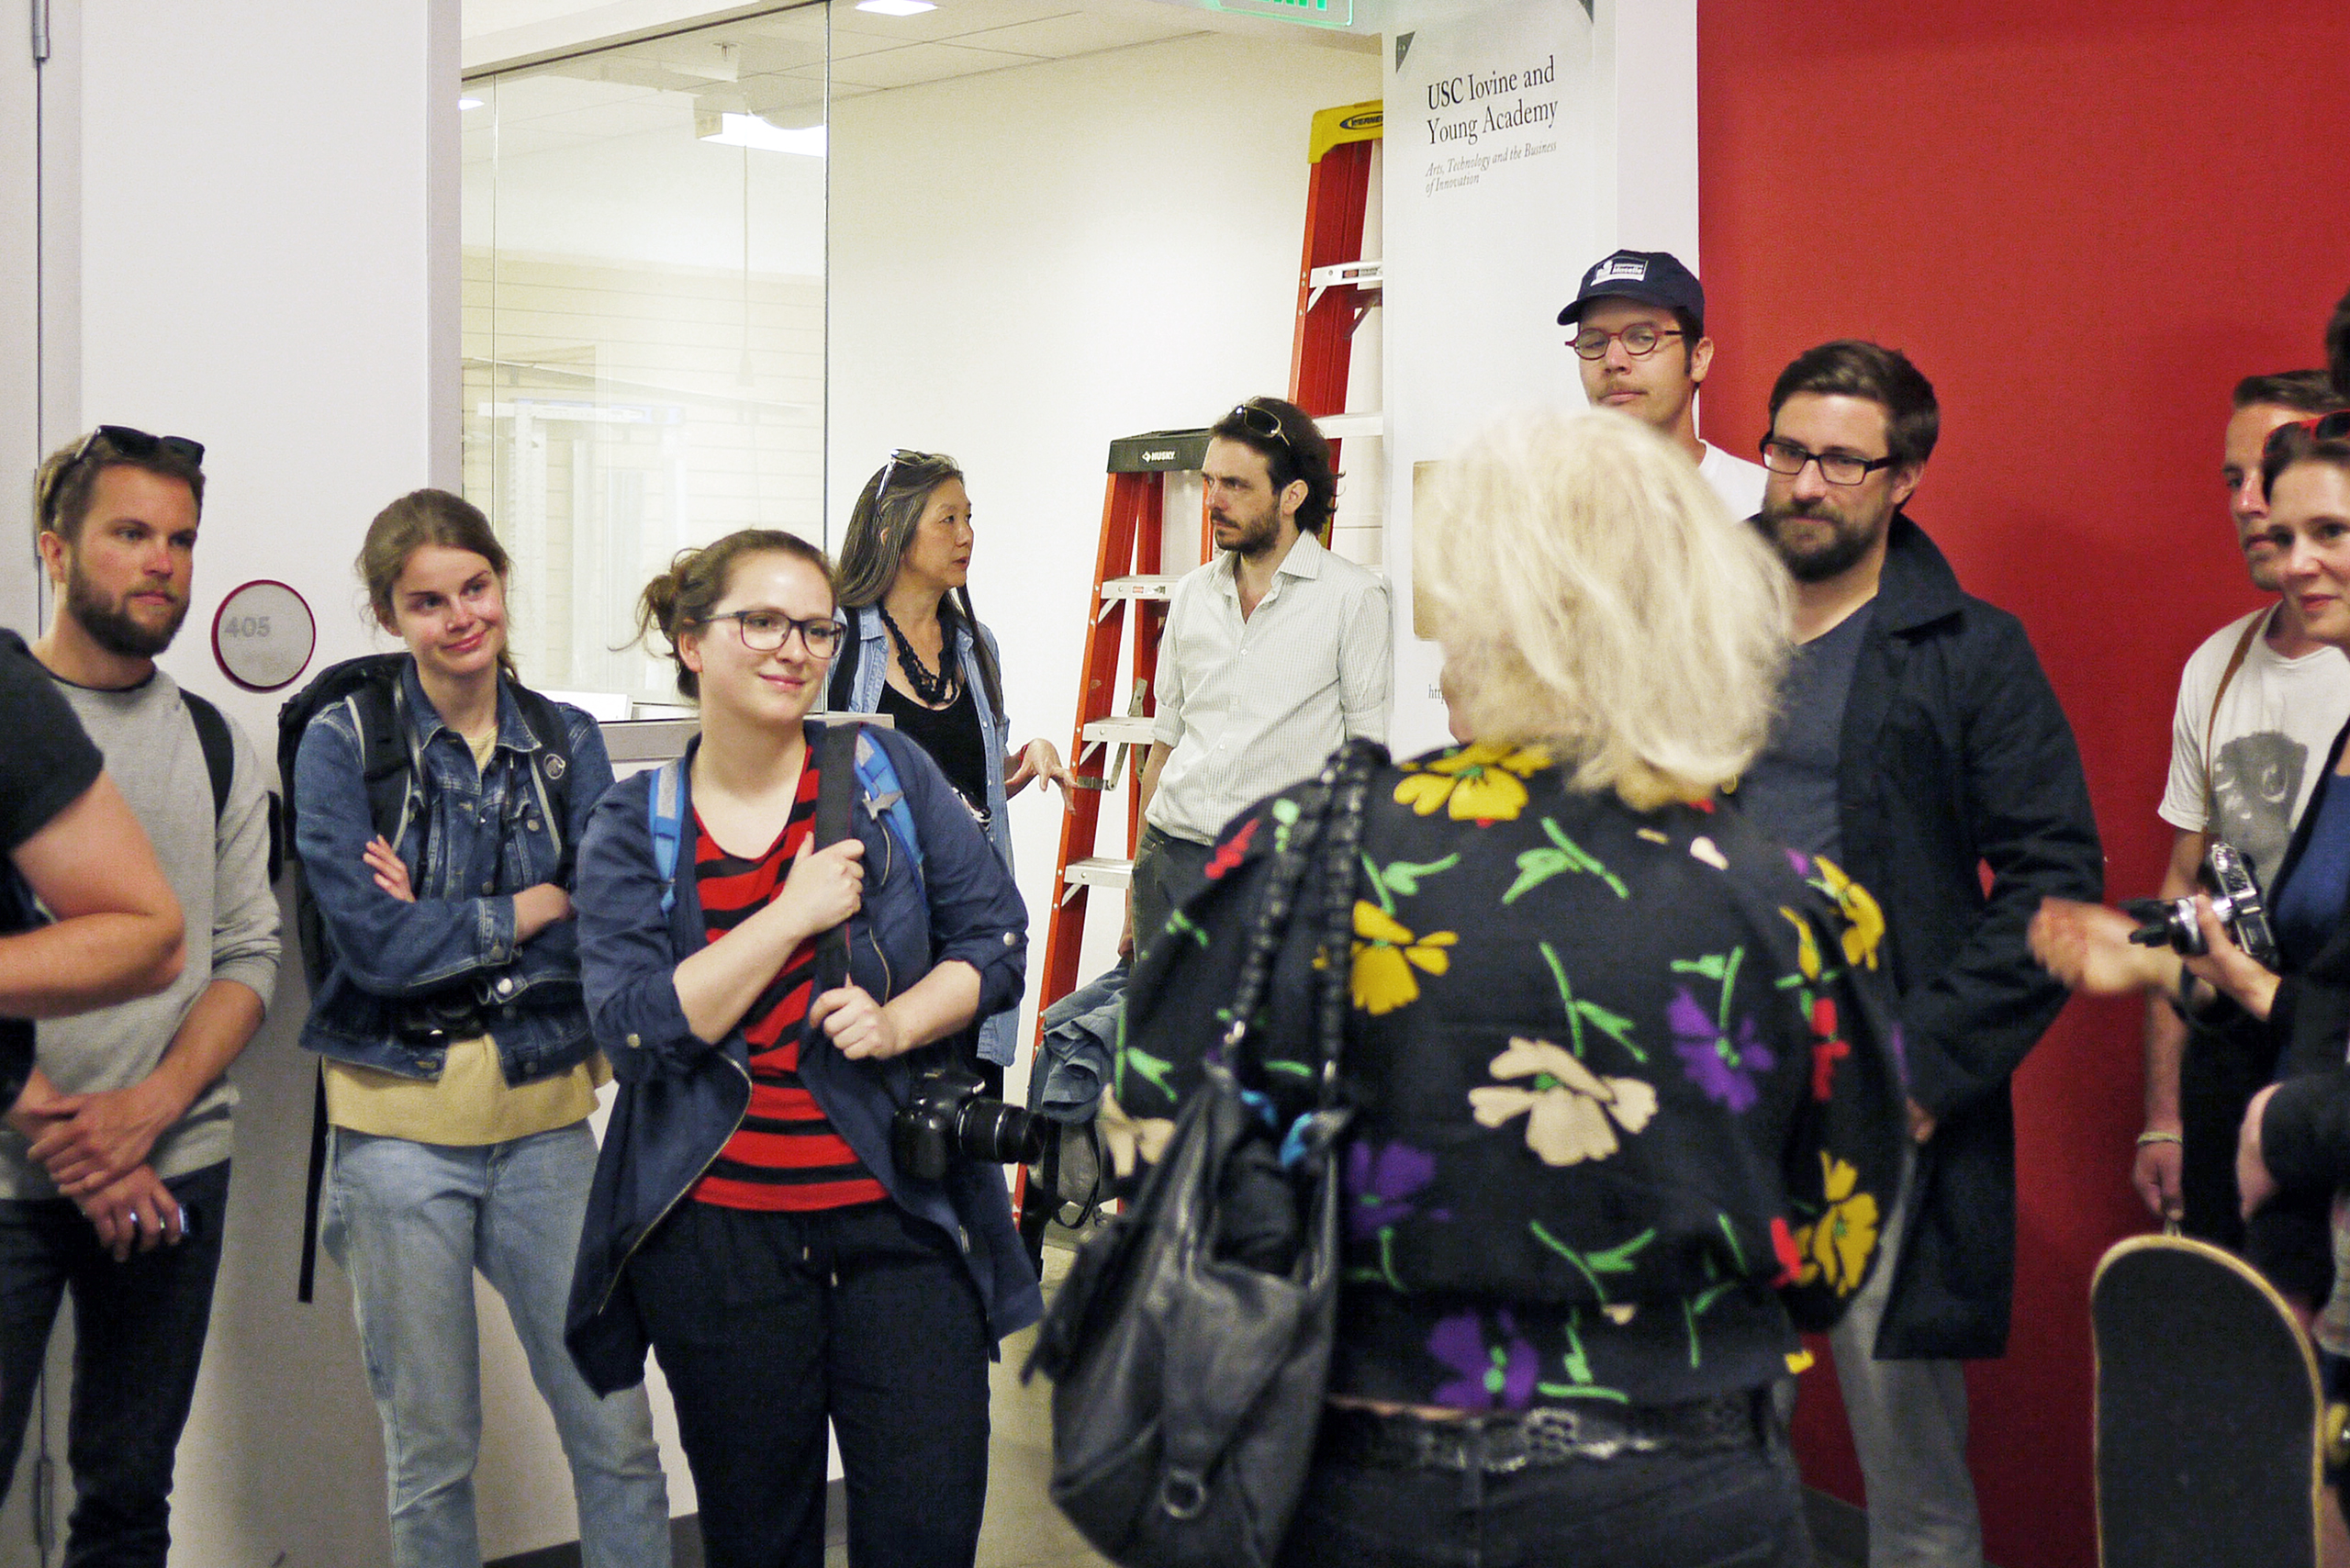 Roski School of Design (USC) with Prof. Haven Lin-Kirk and Prof. Ewa Wojciak; Los Angeles | Photo: Leonarda Spassova